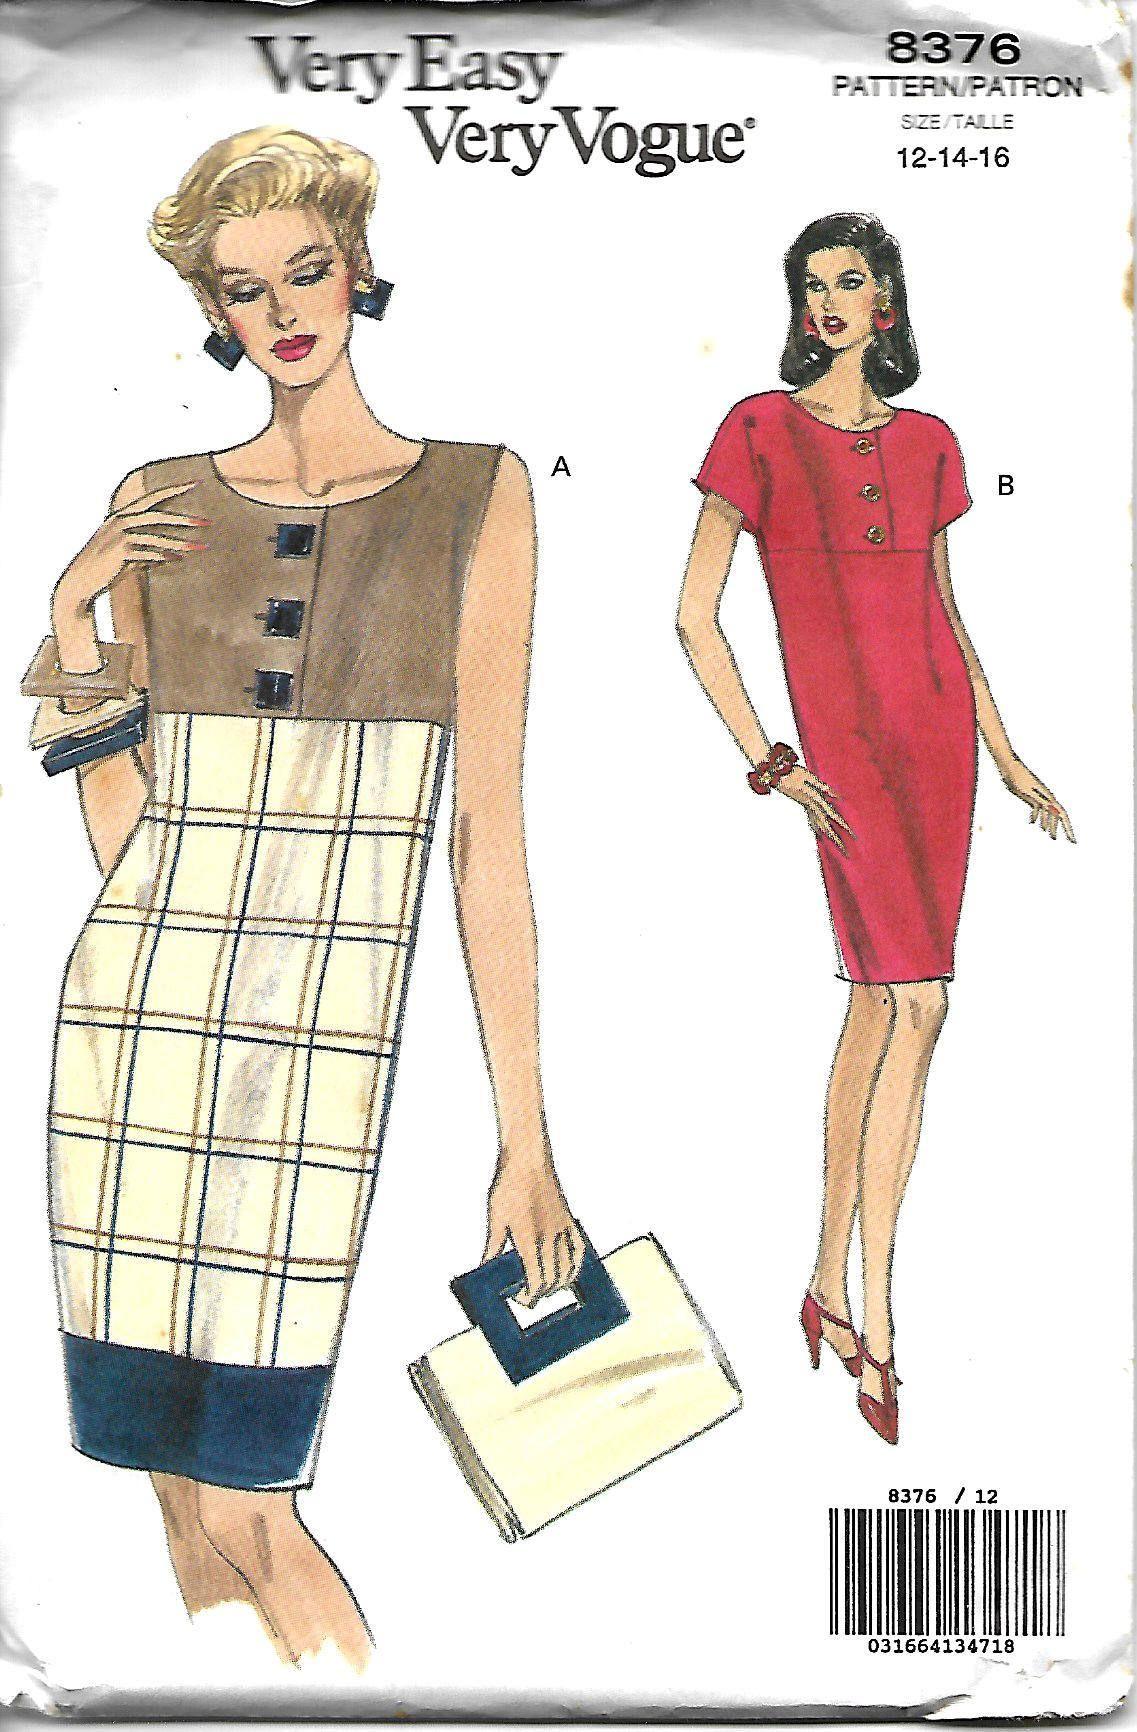 Pin de Karine G en 1990 patterns | Pinterest